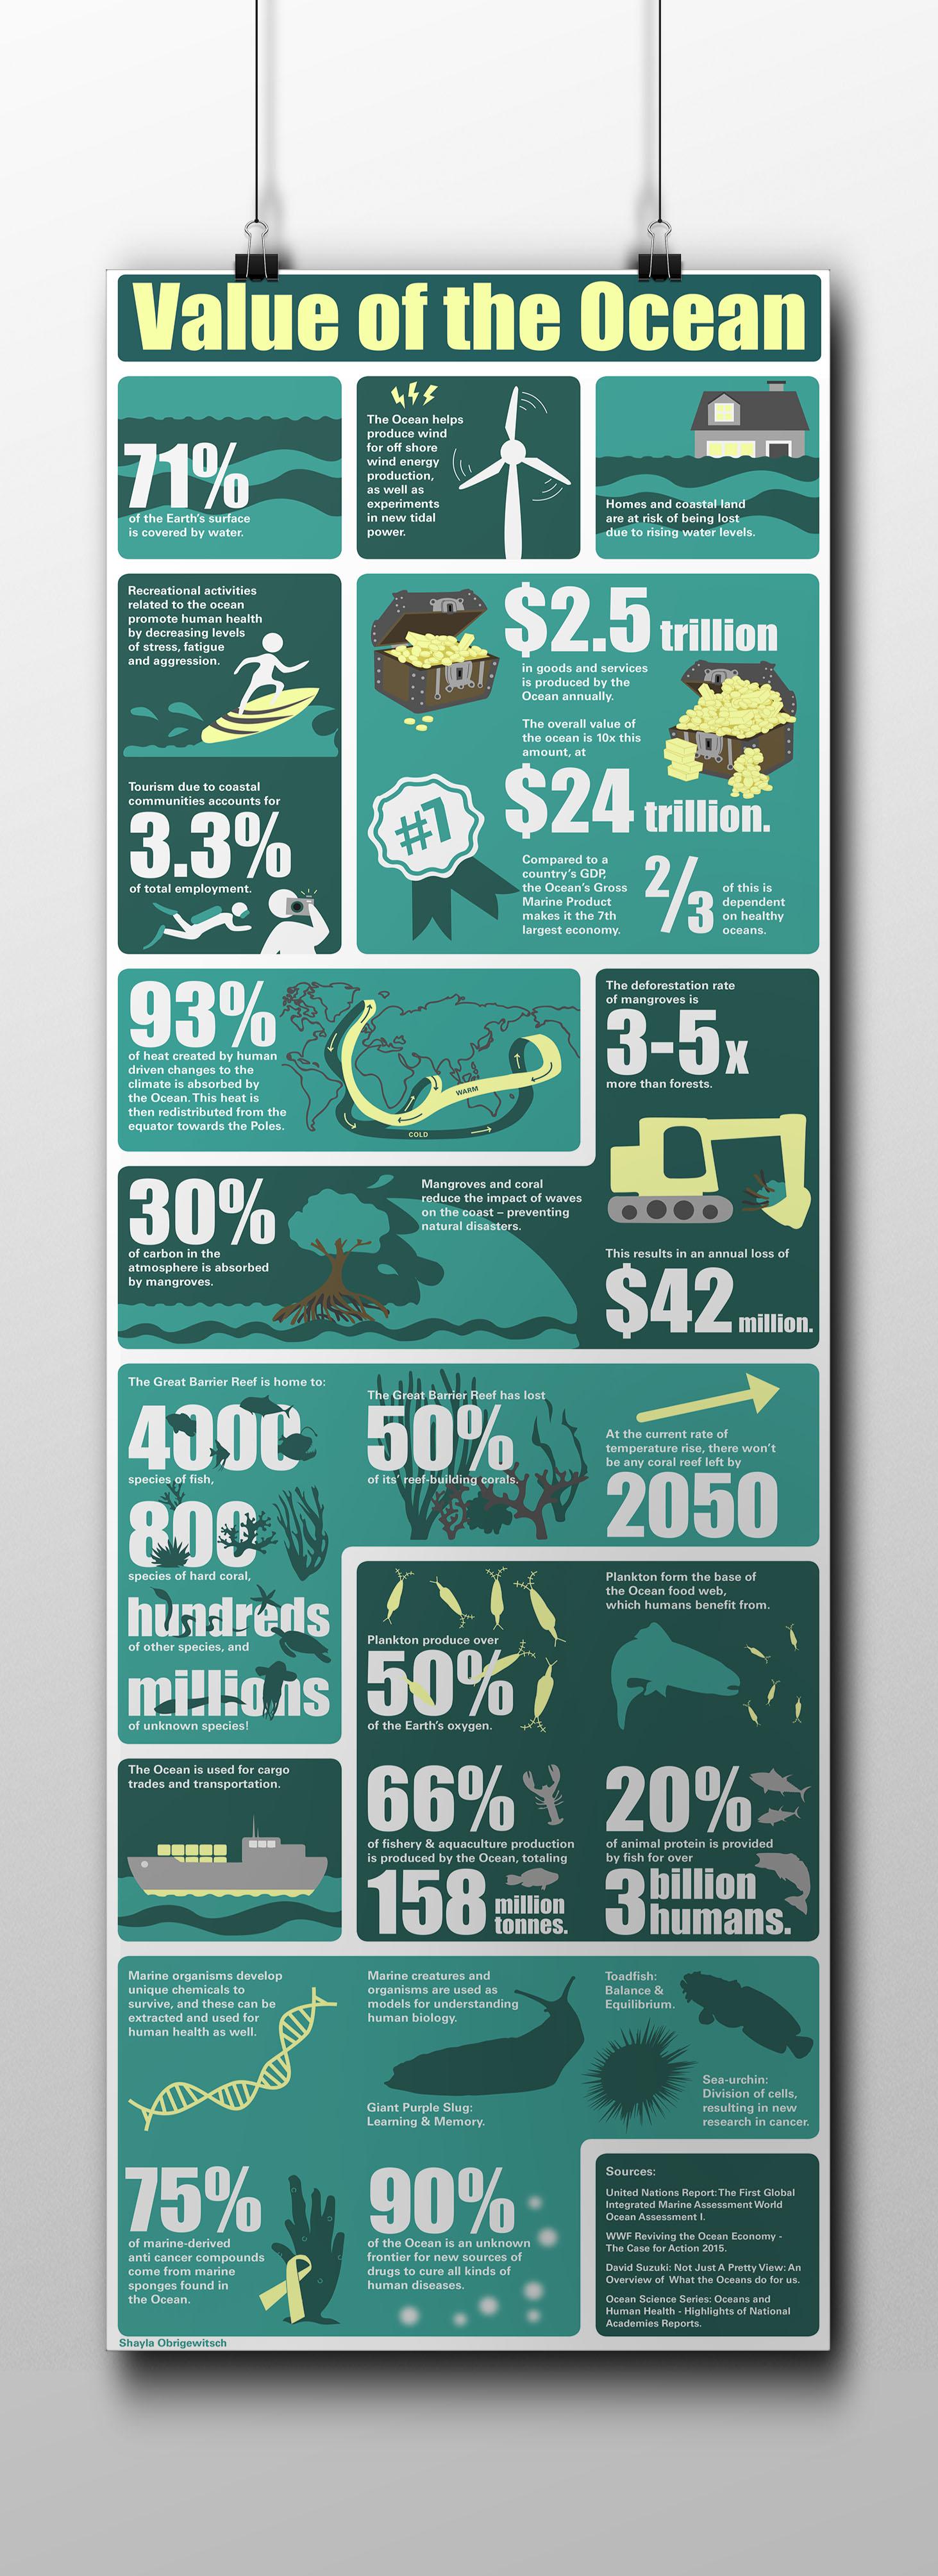 Value of Oceans